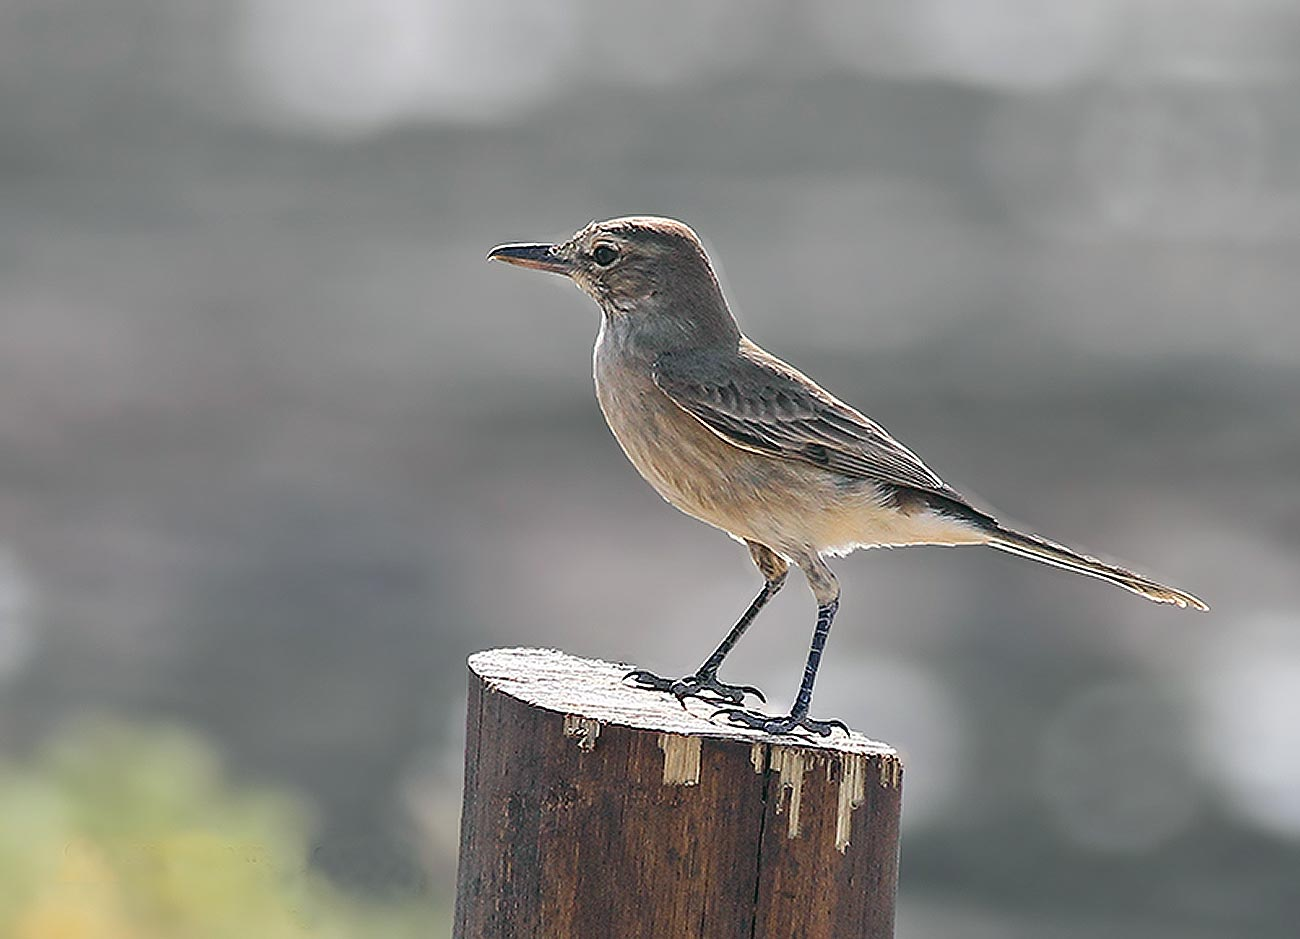 Gaucho común (Agriornis micropterus)